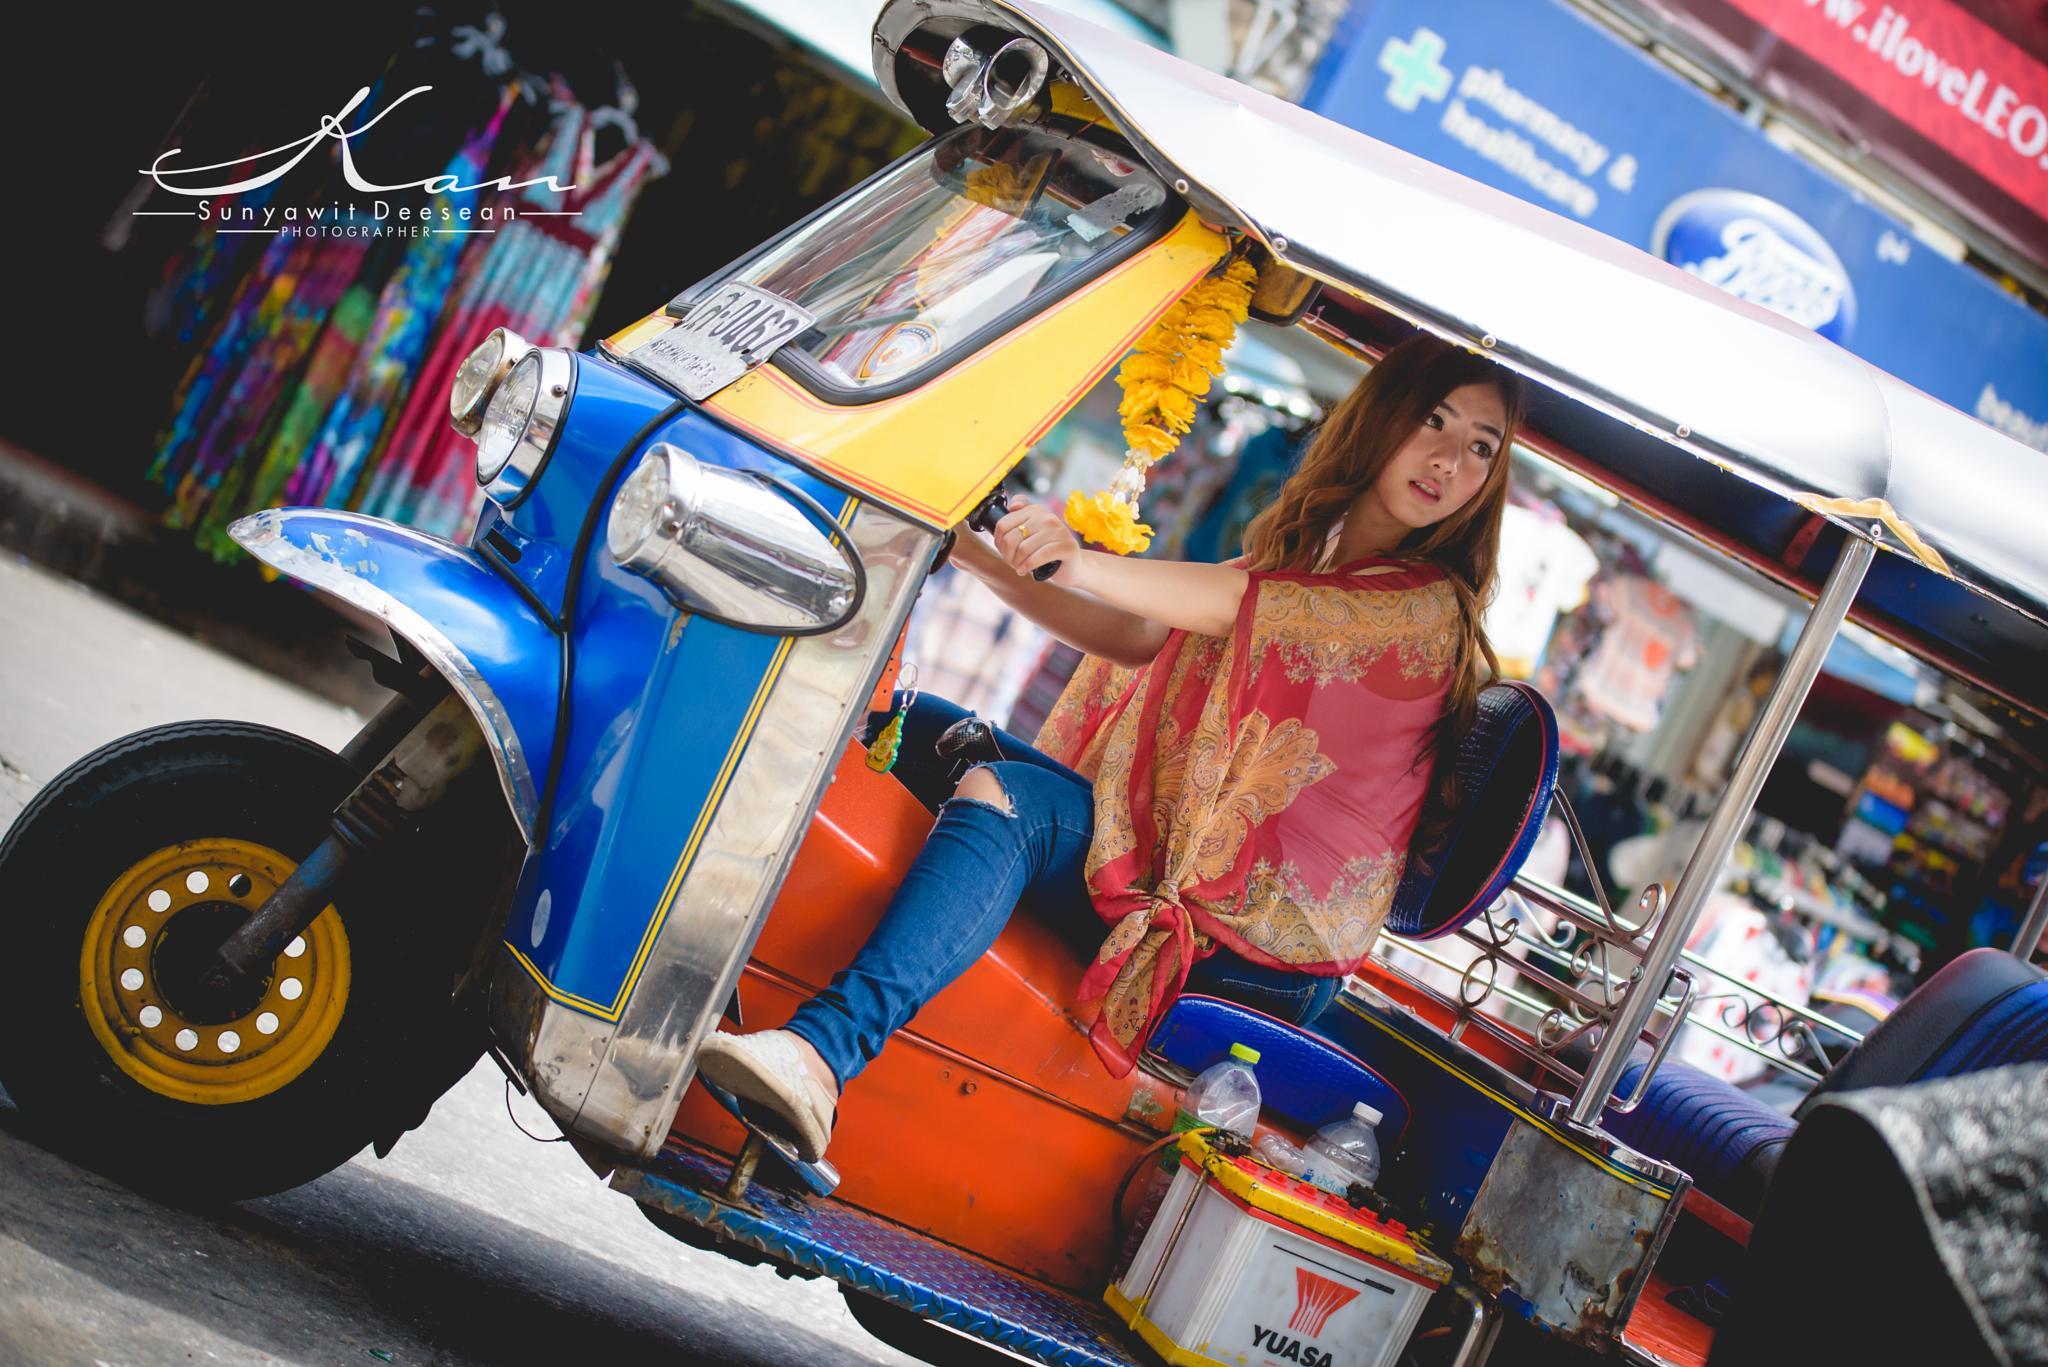 Tuk Tuk Rider by Sunyawit D.